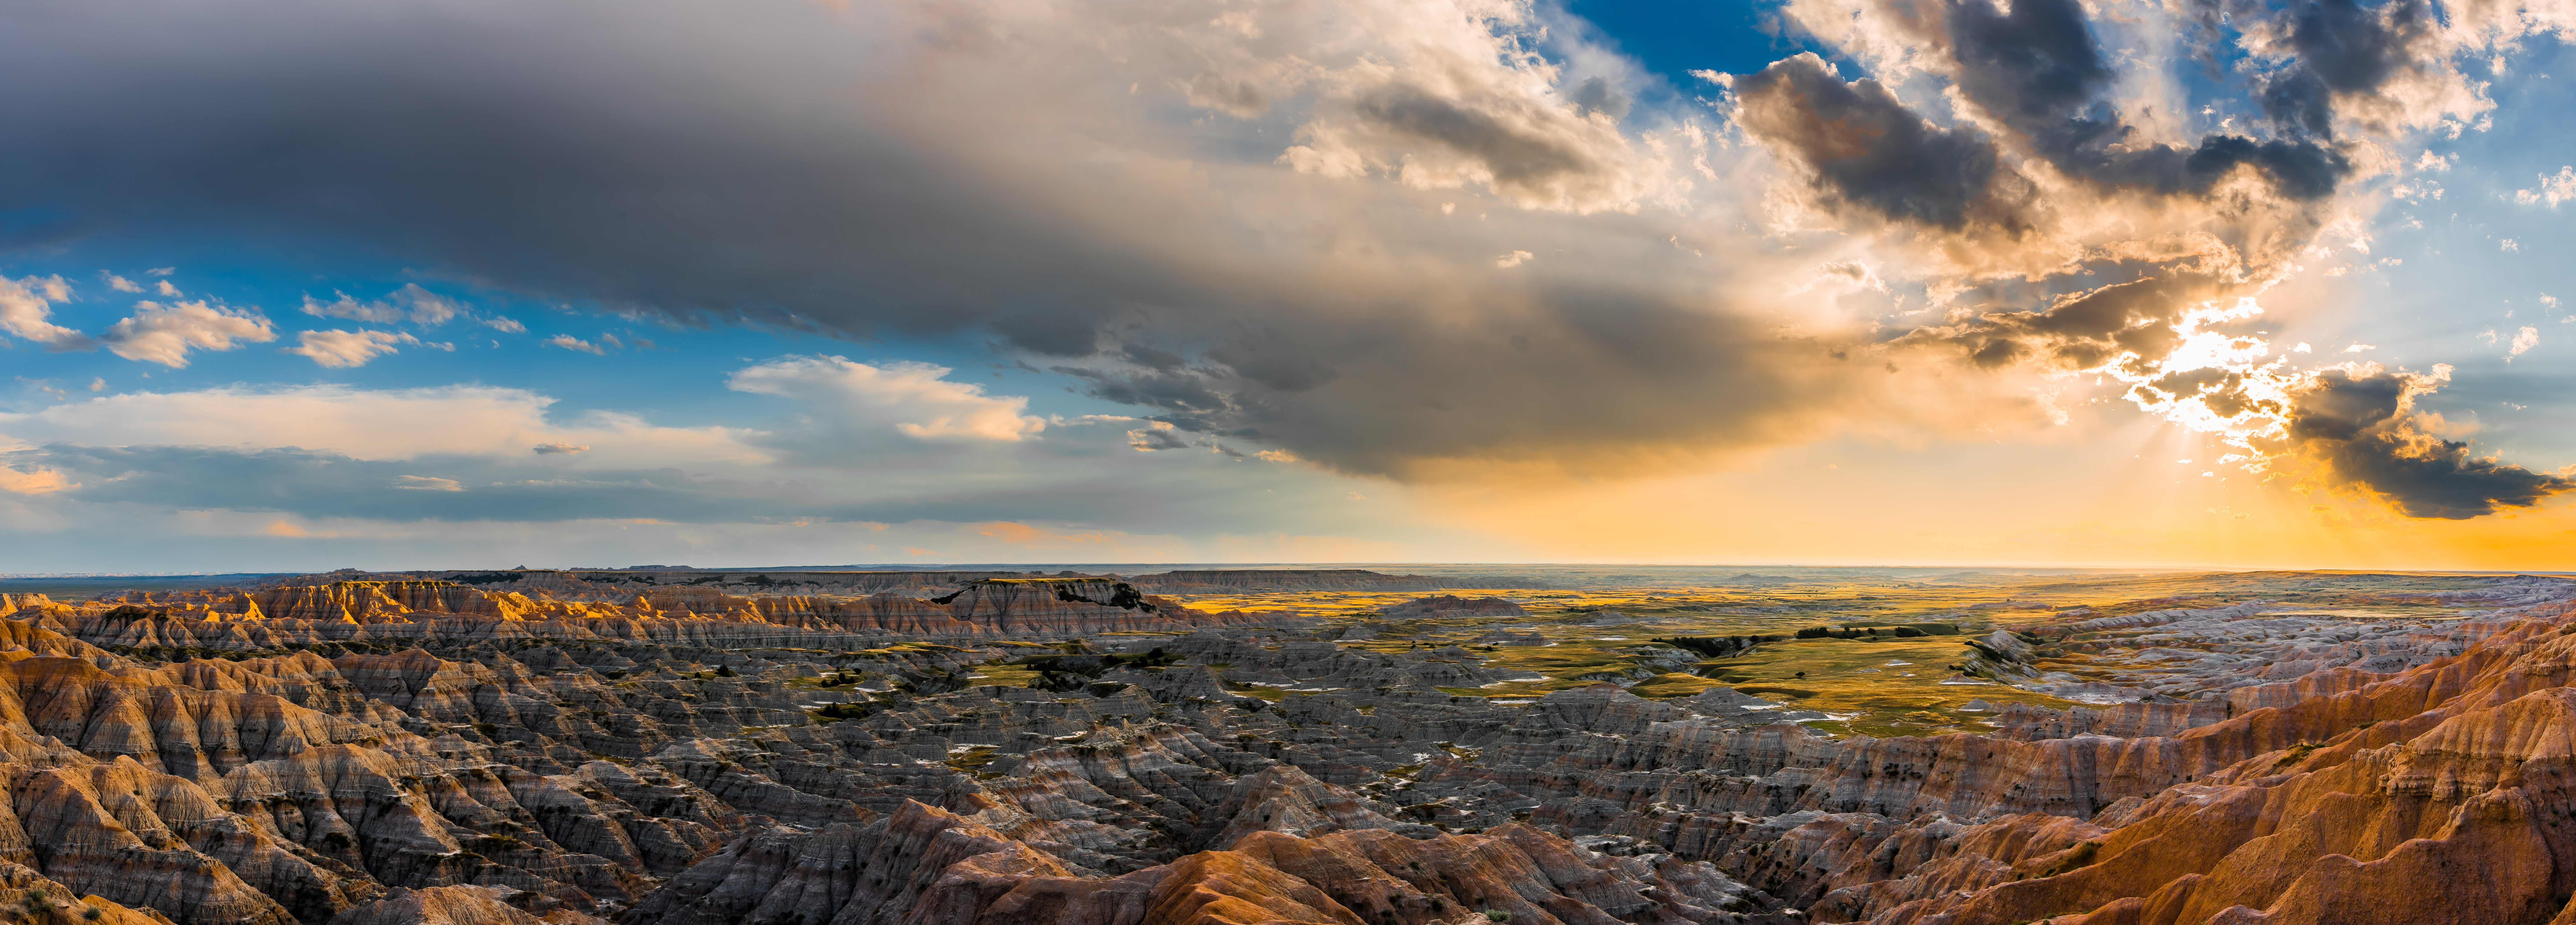 Sunset In Badlands National Park South Dakota 4K Wallpaper